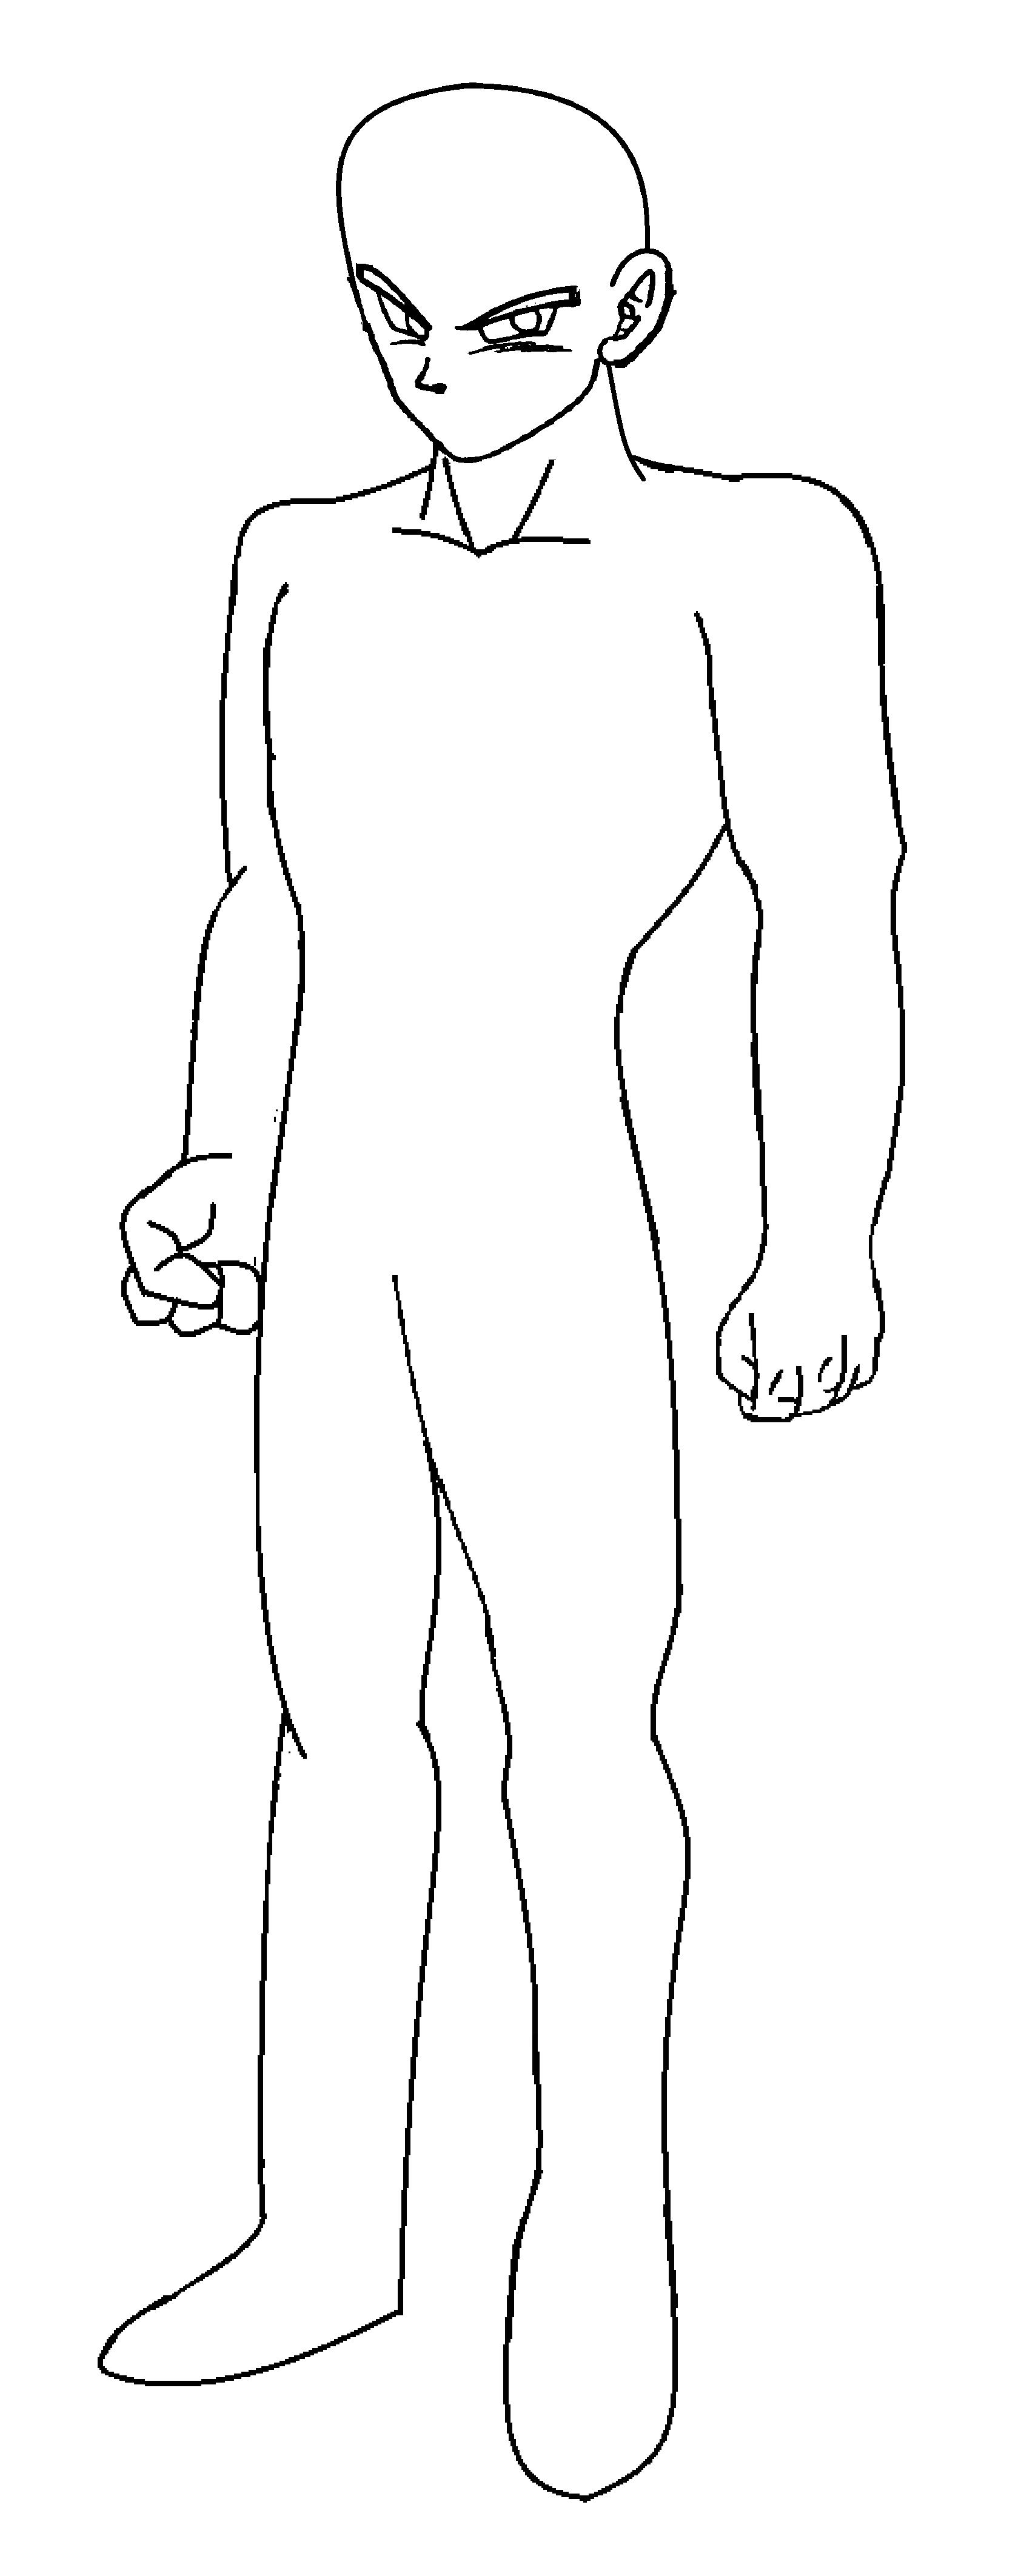 Dragon ball z body templates | Ultra Dragon Ball Wiki | FANDOM ...